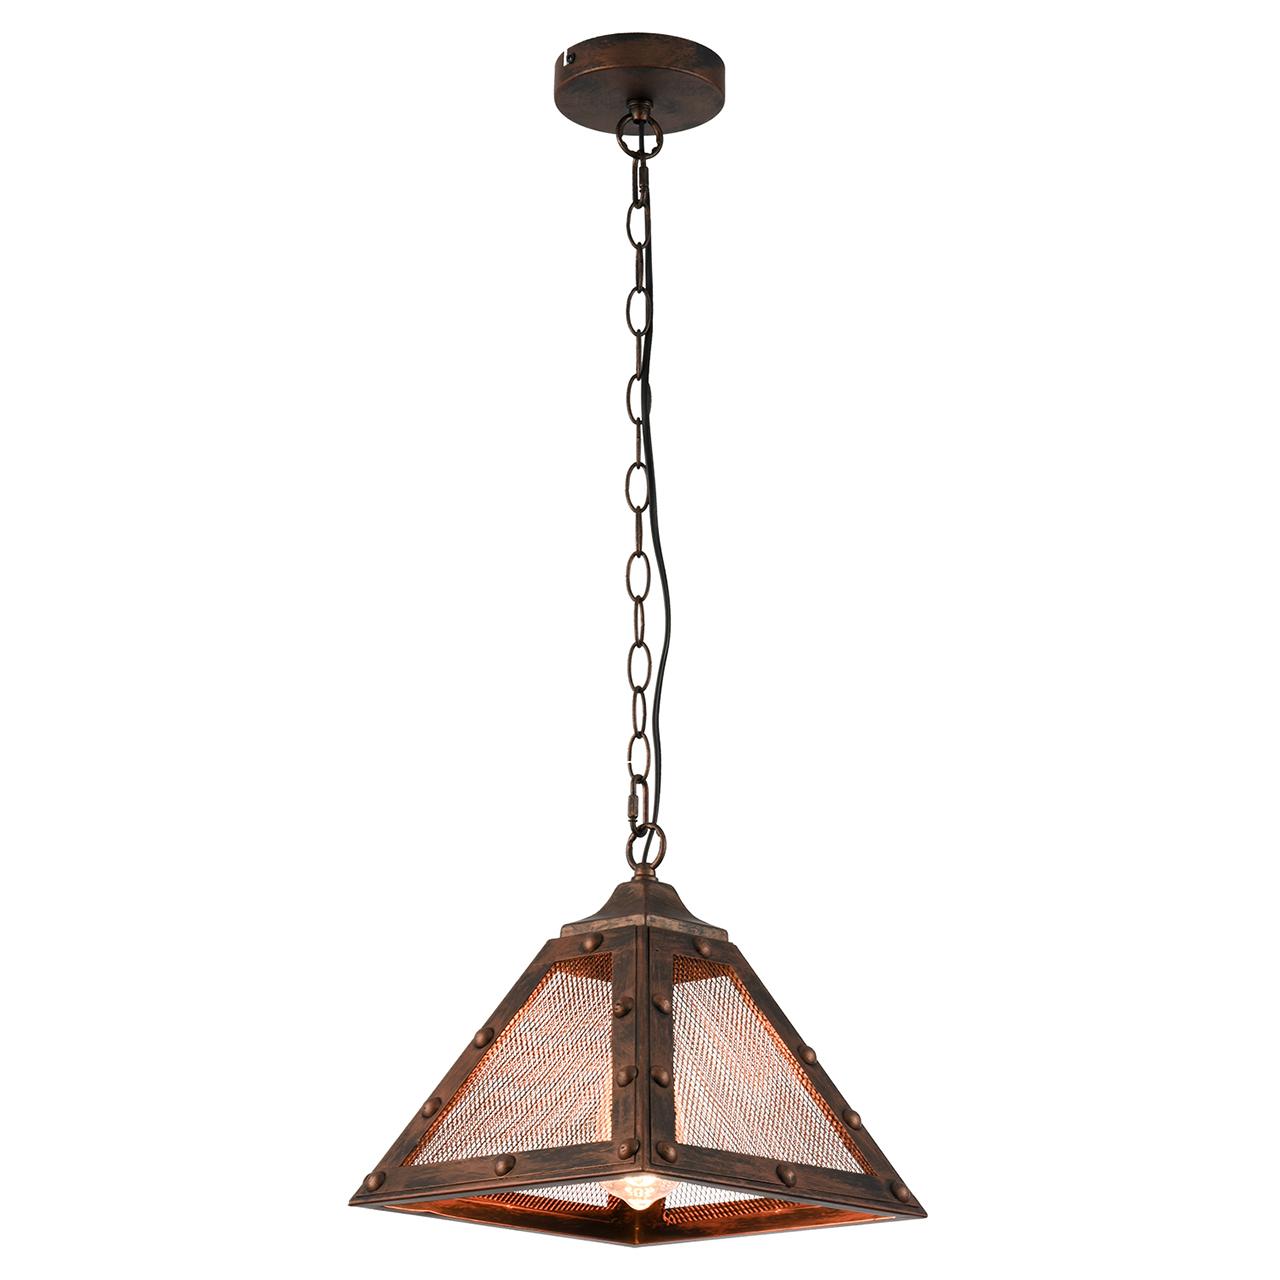 цена на Подвесной светильник Lussole Loft Mirta LSP-9836